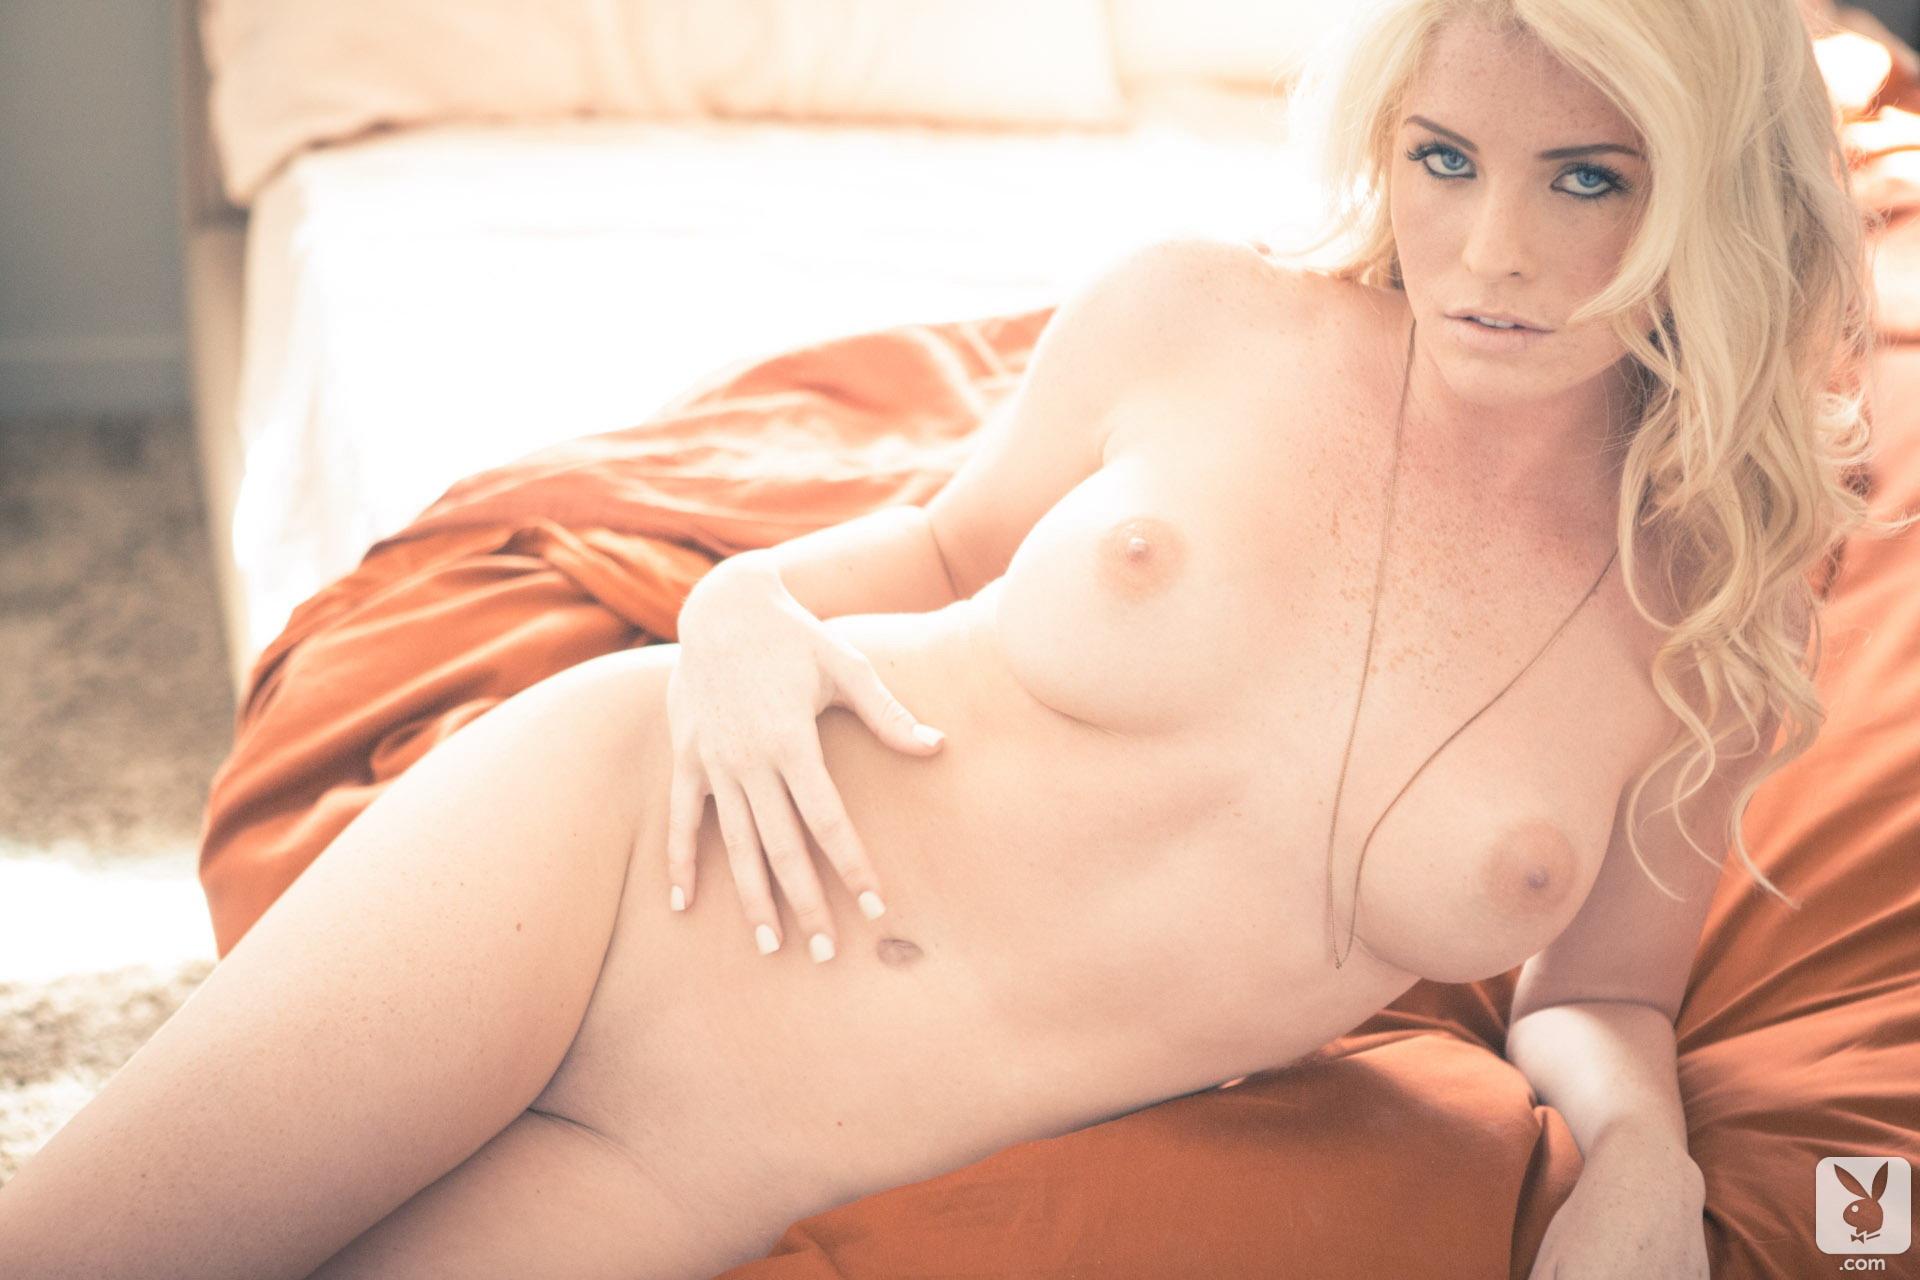 Carly lauren nackt